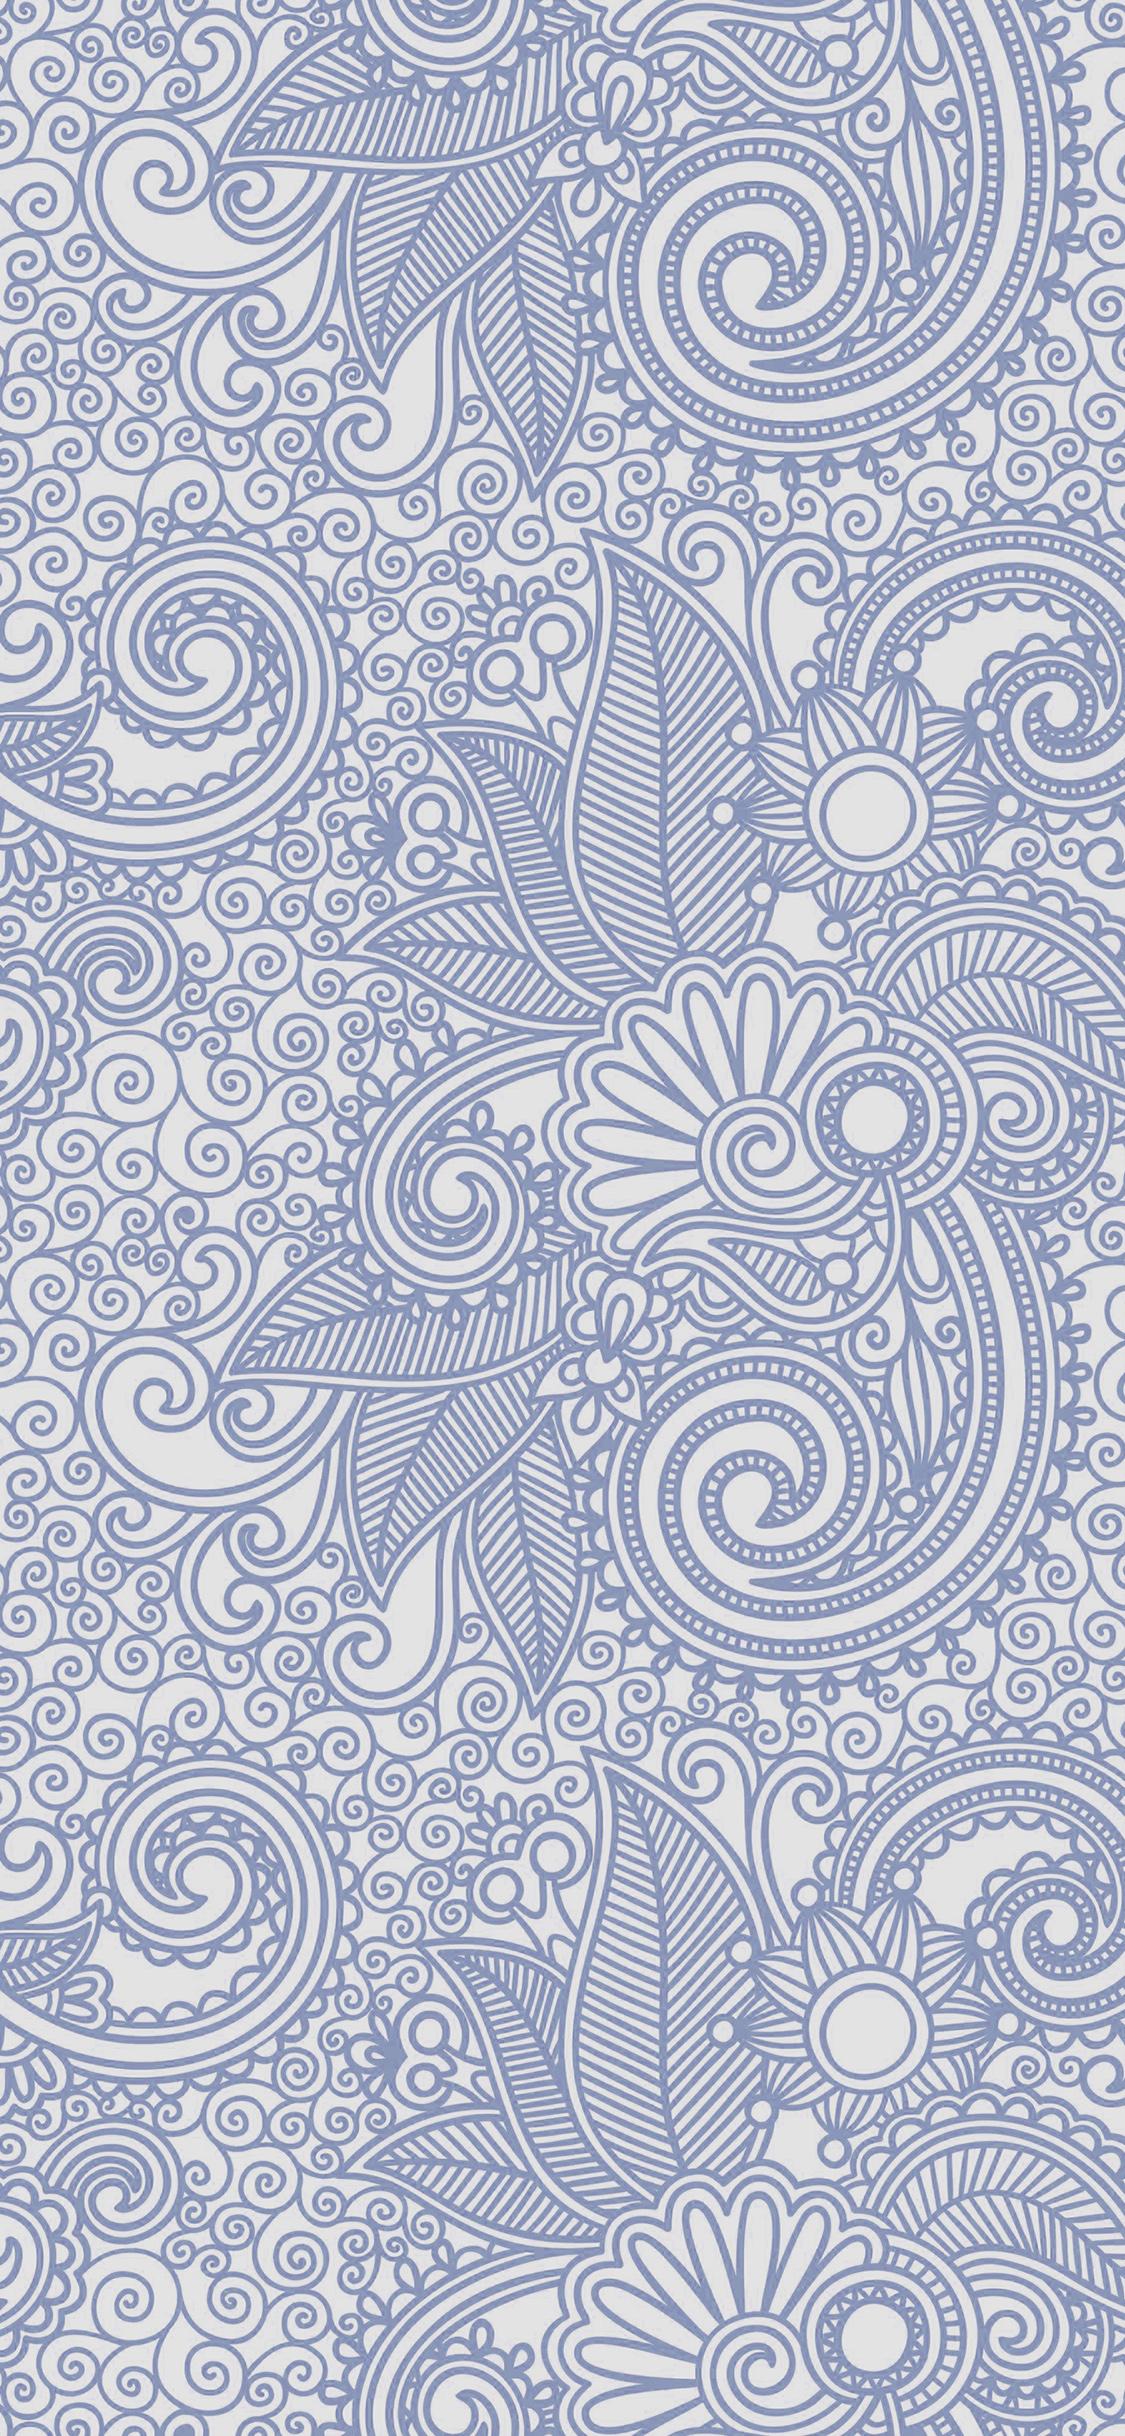 iPhonexpapers.com-Apple-iPhone-wallpaper-vk28-wallpaper-design-flower-line-blue-pattern